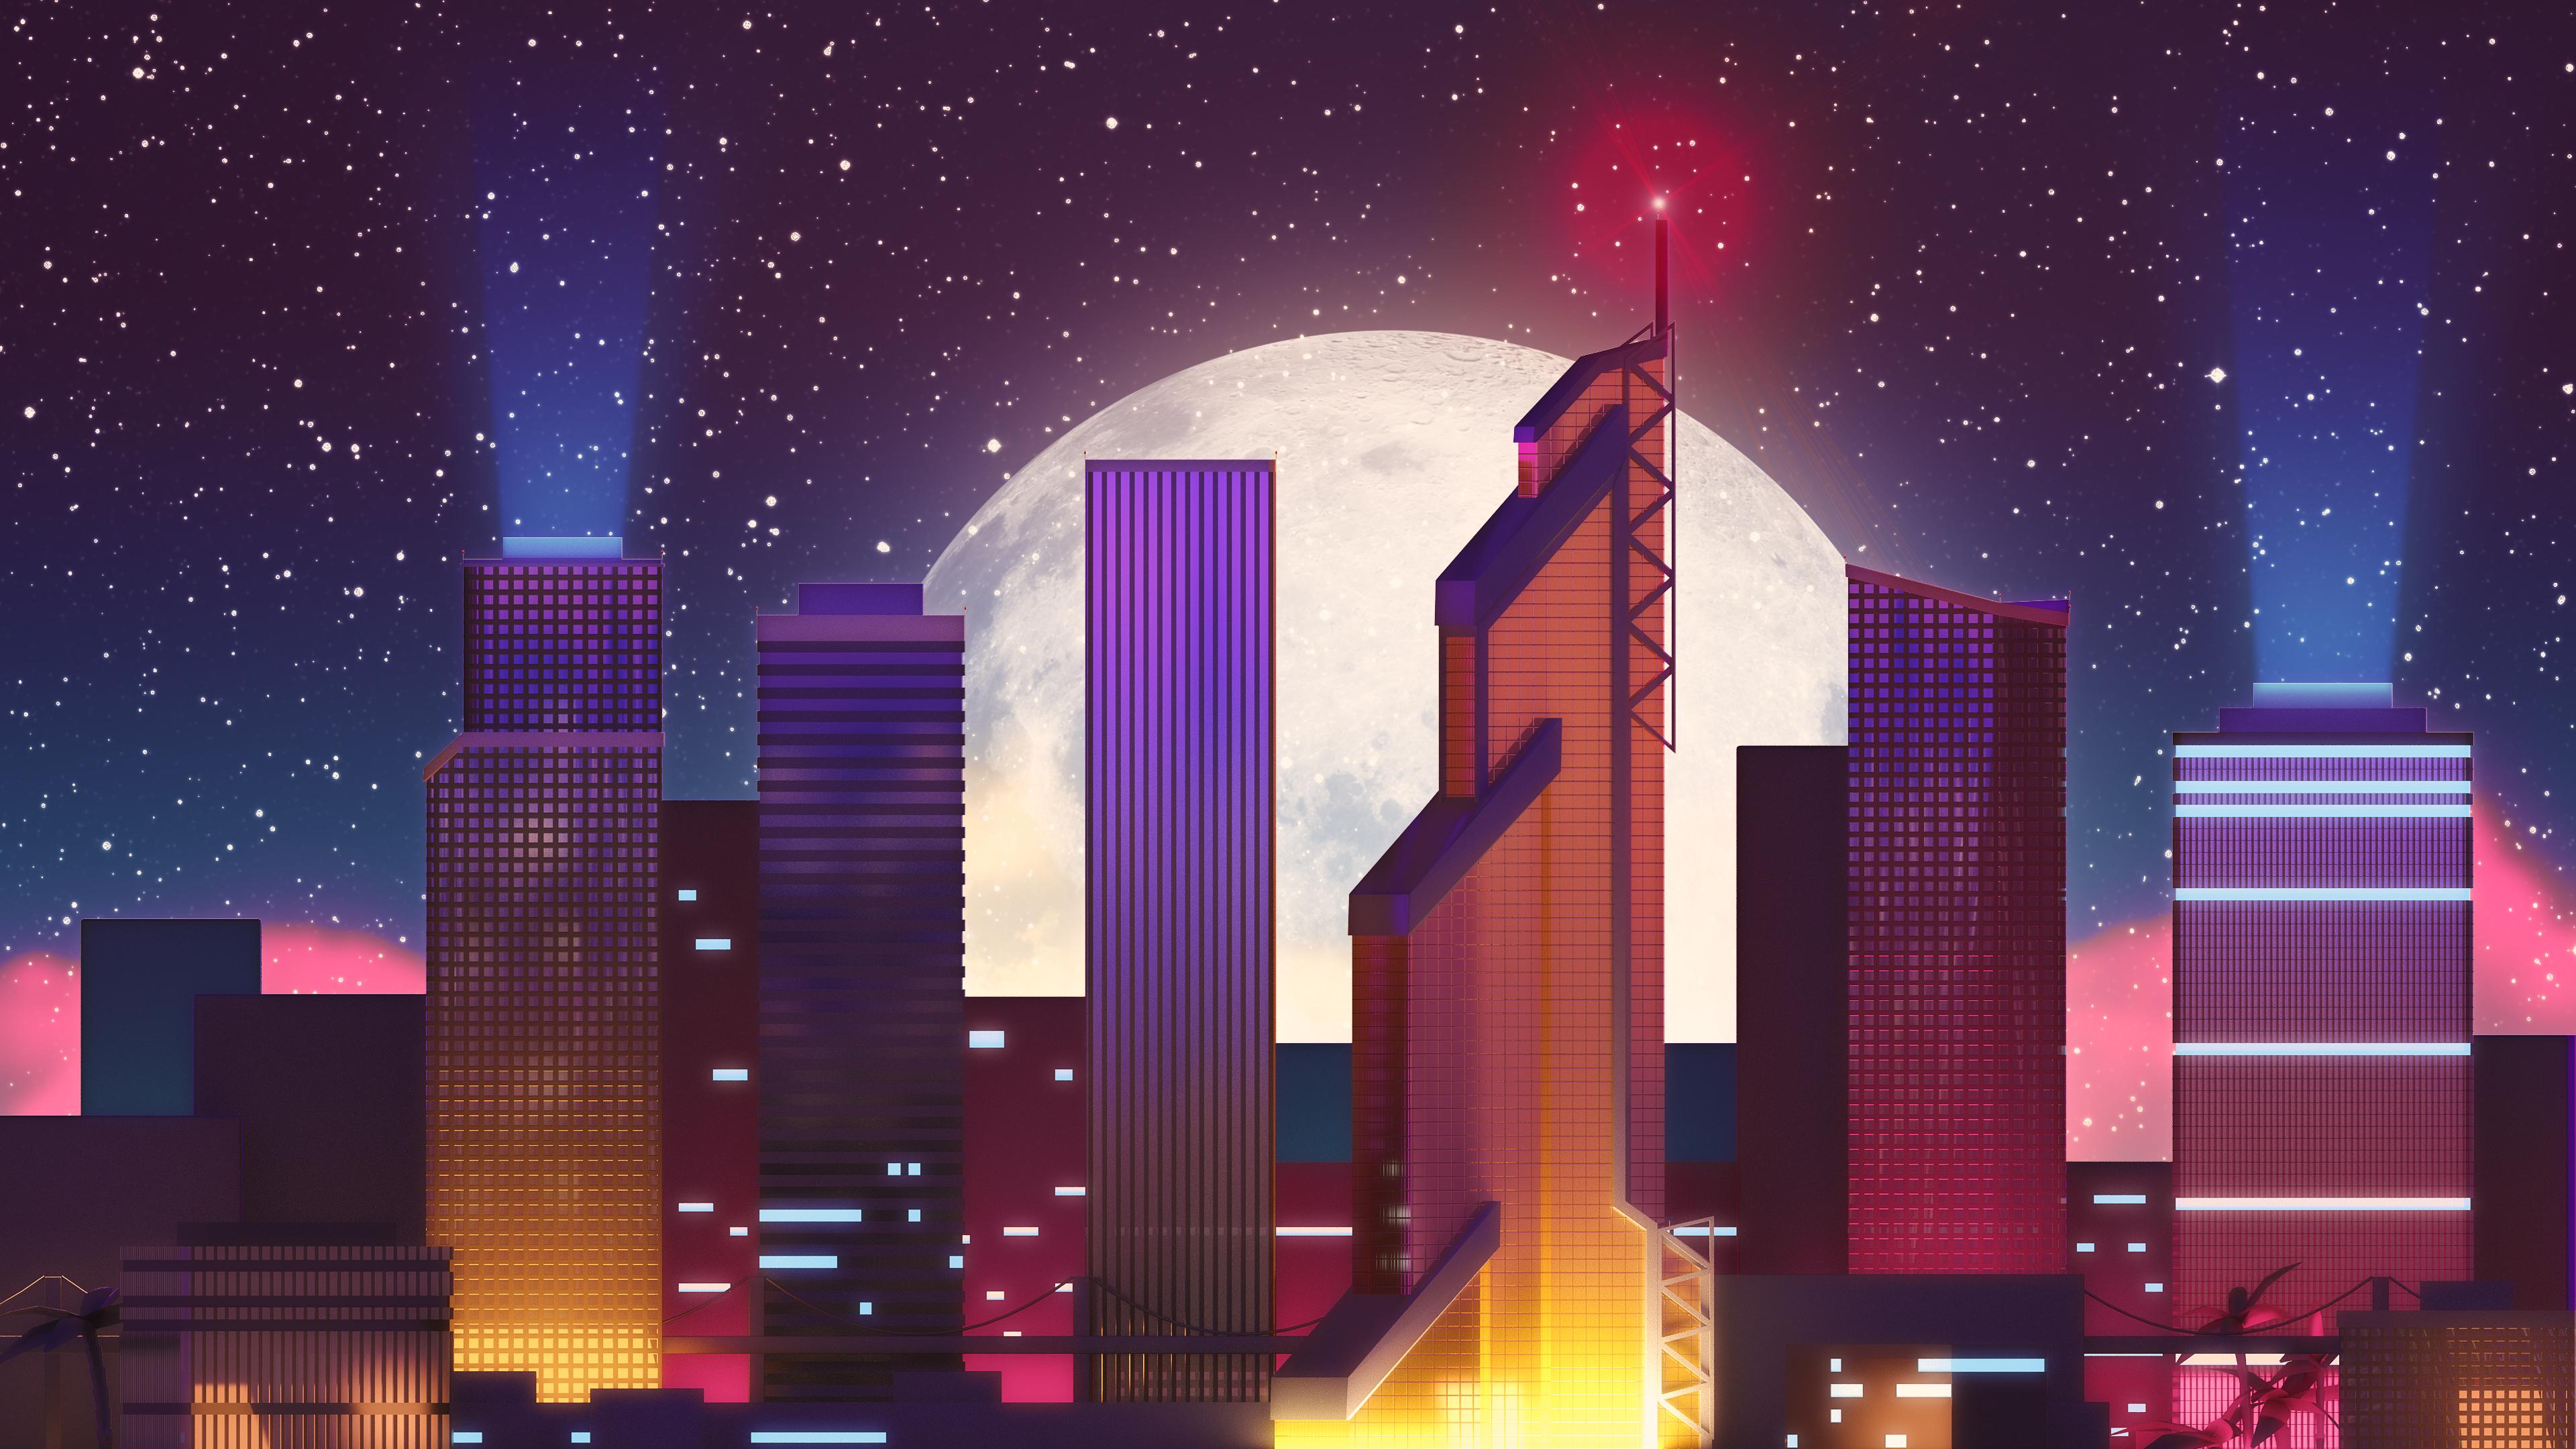 3d Hd Vaporwave Wallpaper Neon City 4k Wallpapers Hd Wallpapers Id 23435